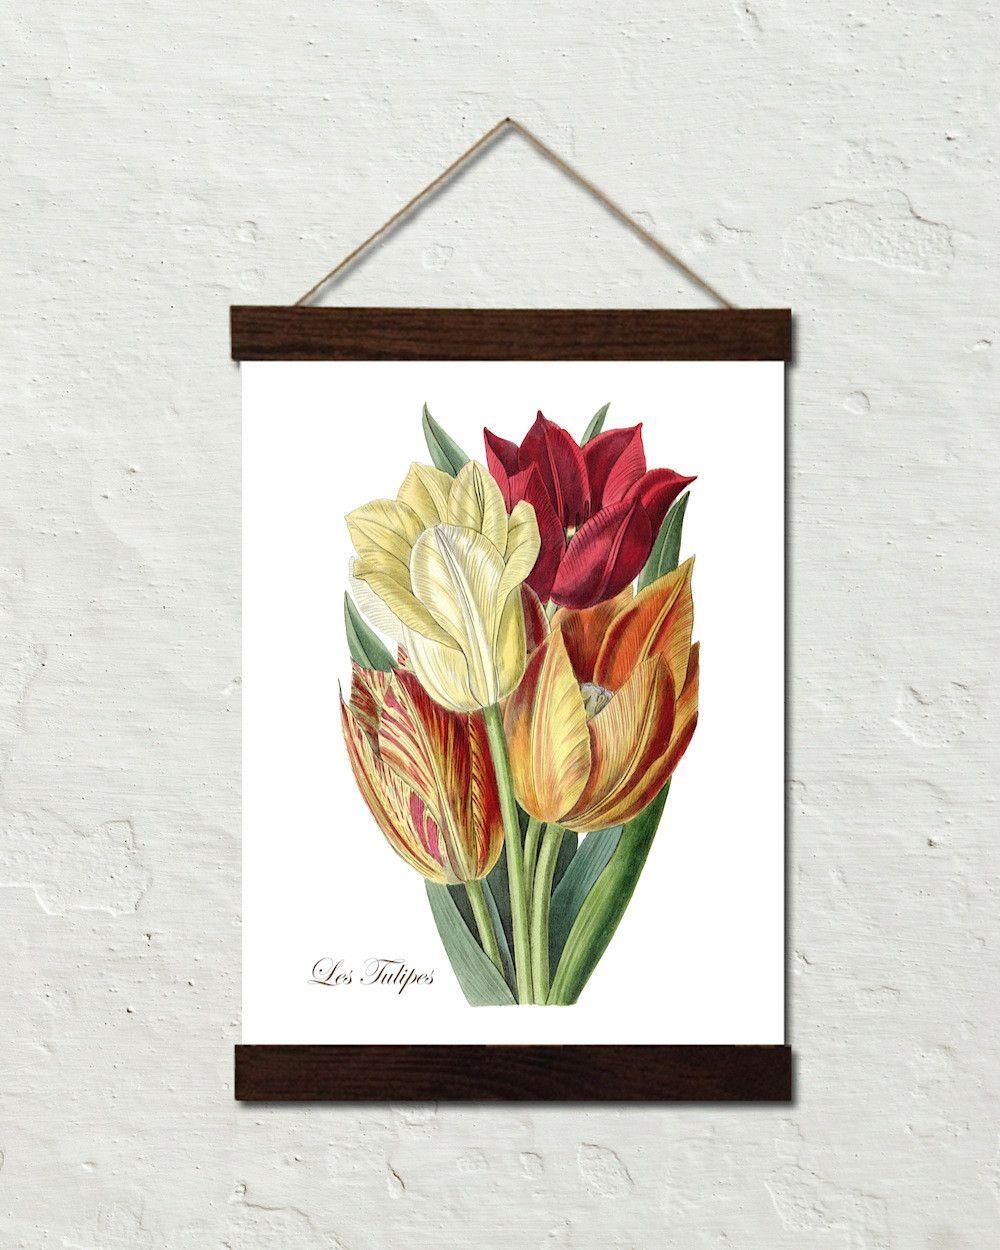 Vintage Tulips No. 40 Botanical Art Canvas Wall Hanging